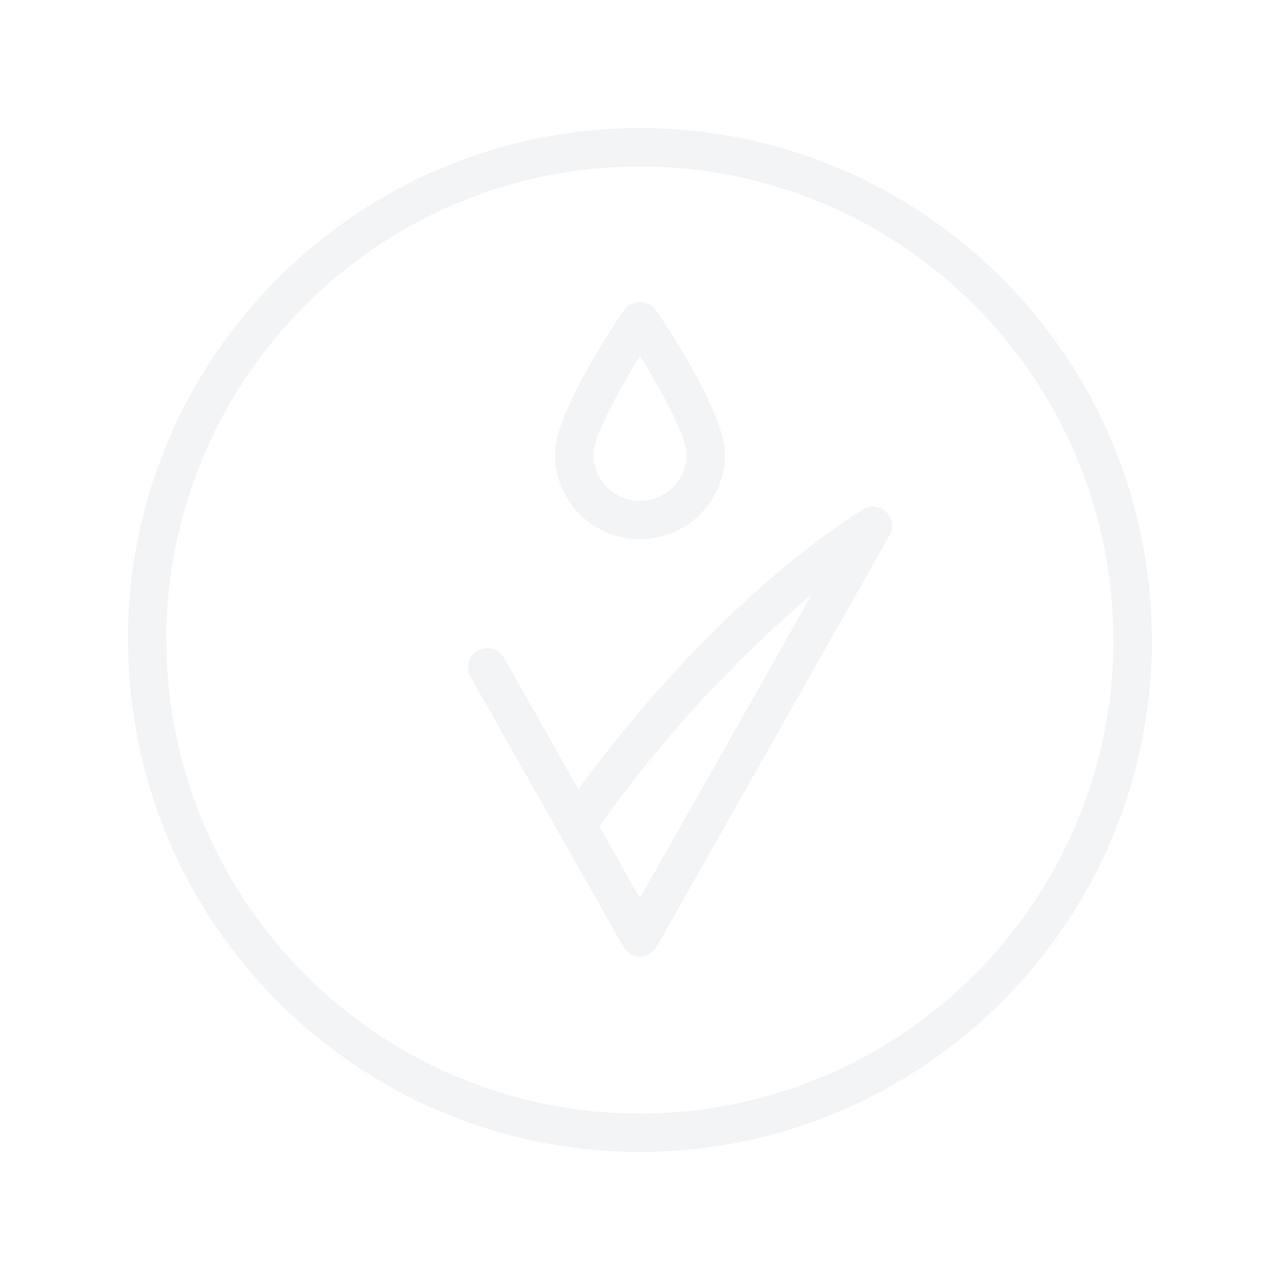 MAYBELLINE Fit Me Matte+Poreless Powder 14g